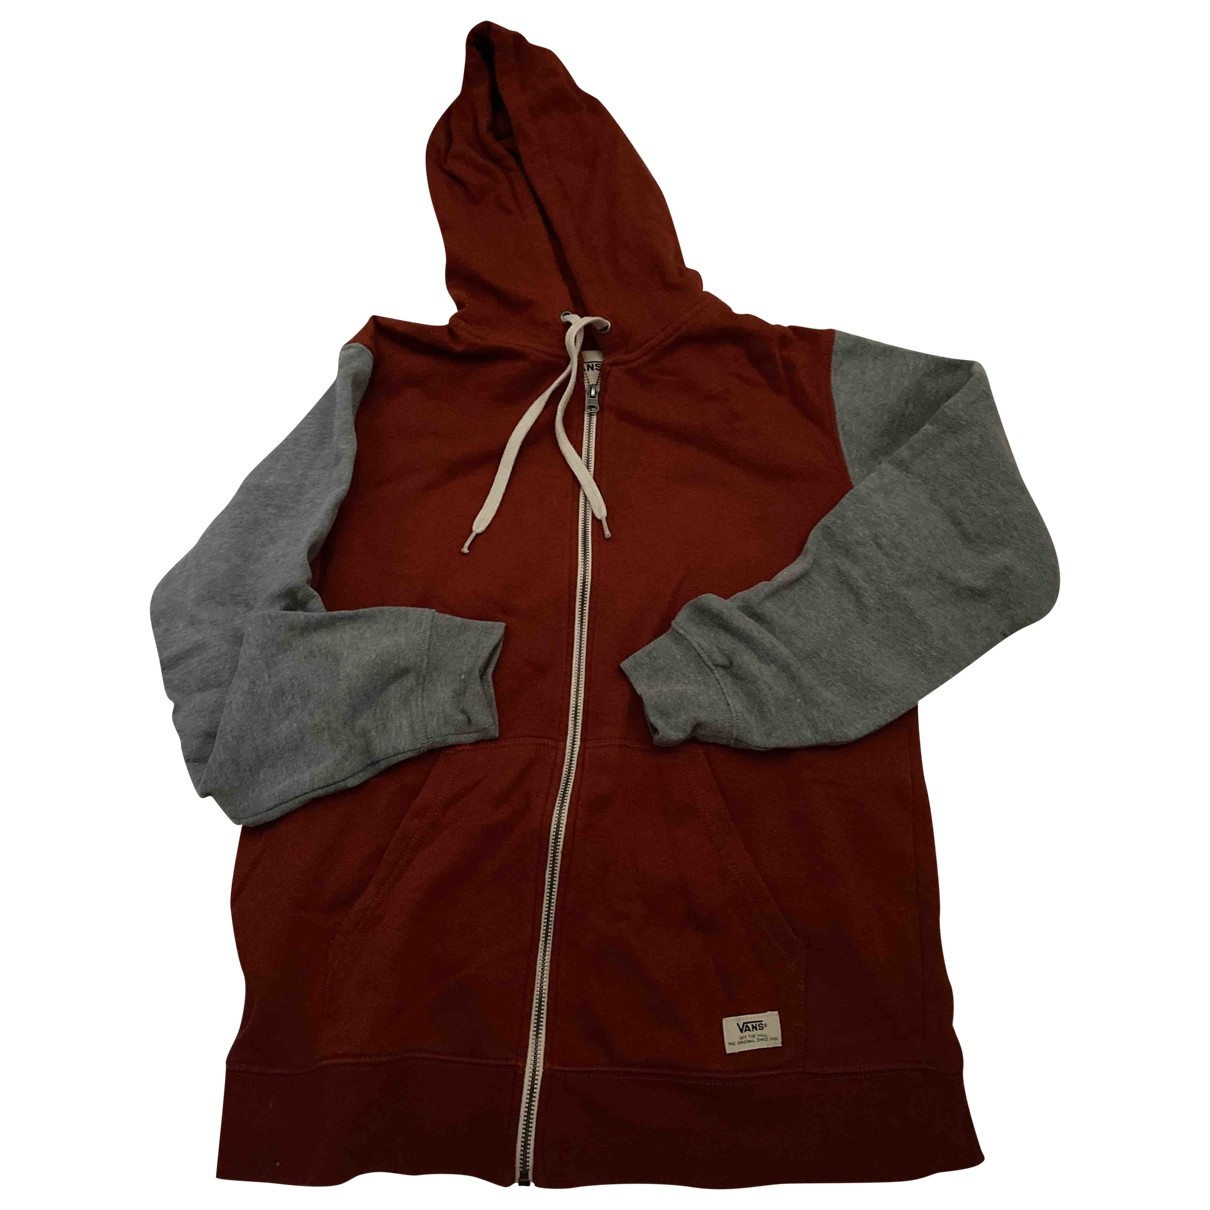 Vans \N Orange Cotton jacket  for Men XS International